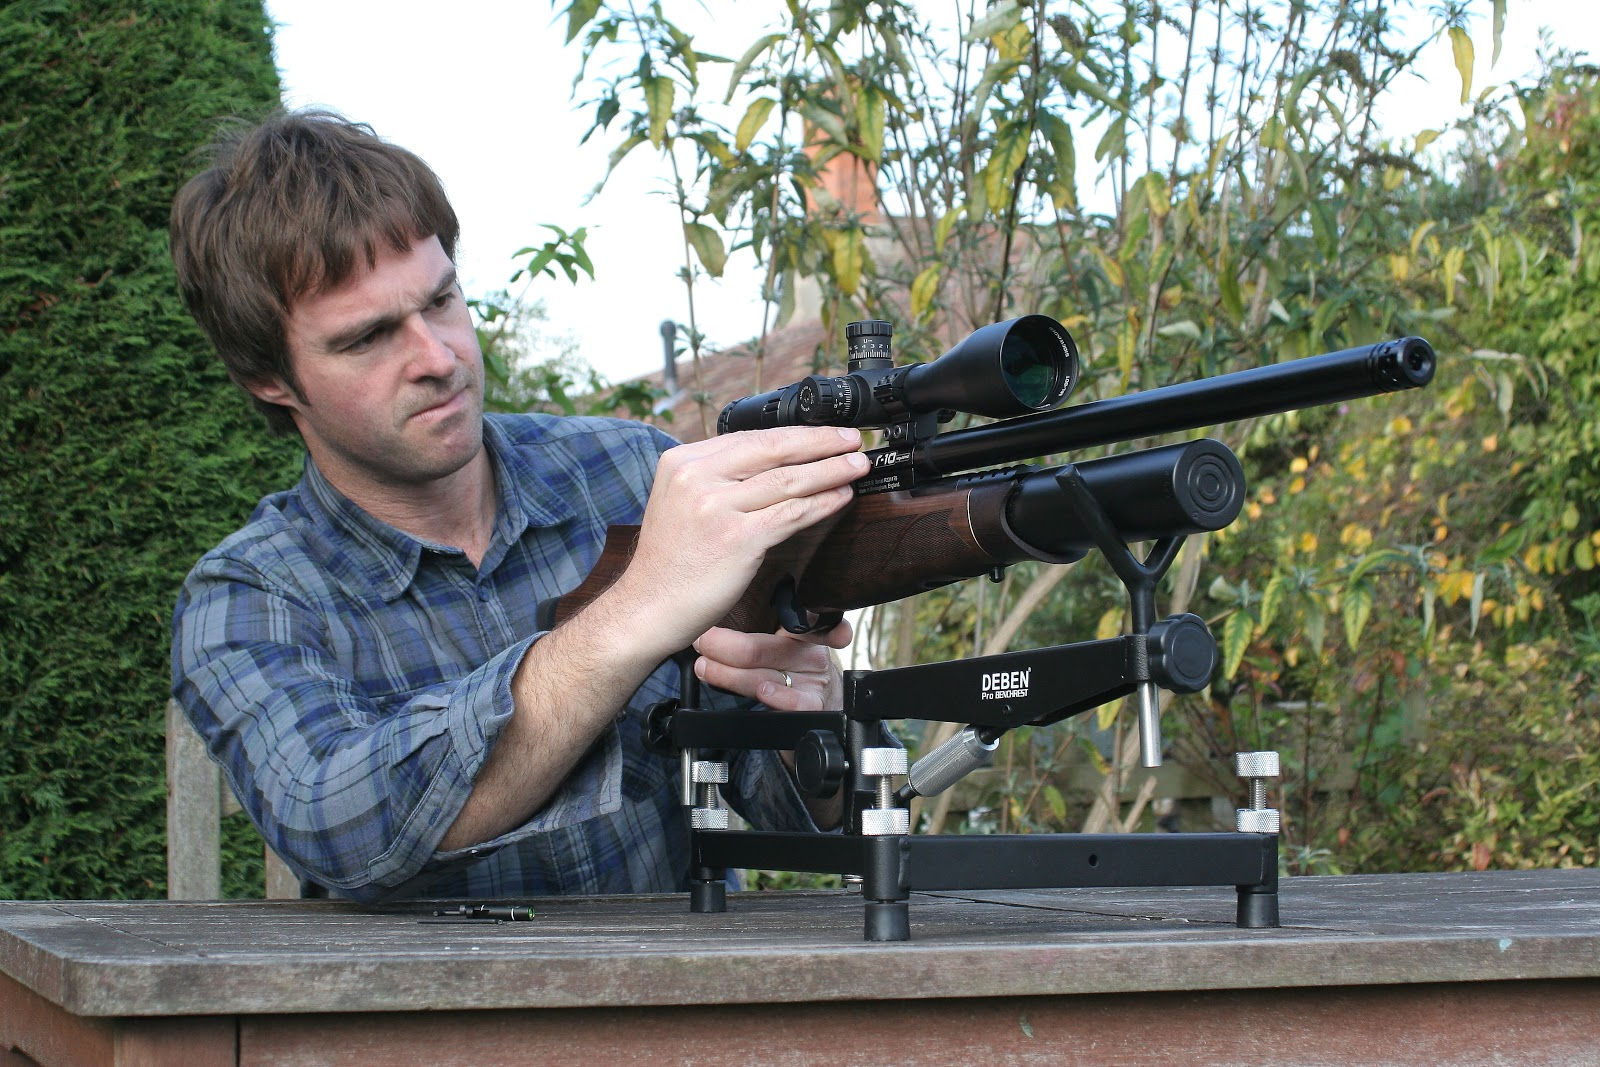 Benchrest Shooting Technique: Mat Manning's Air Rifle Hunting: Deben Pro Bench Rest